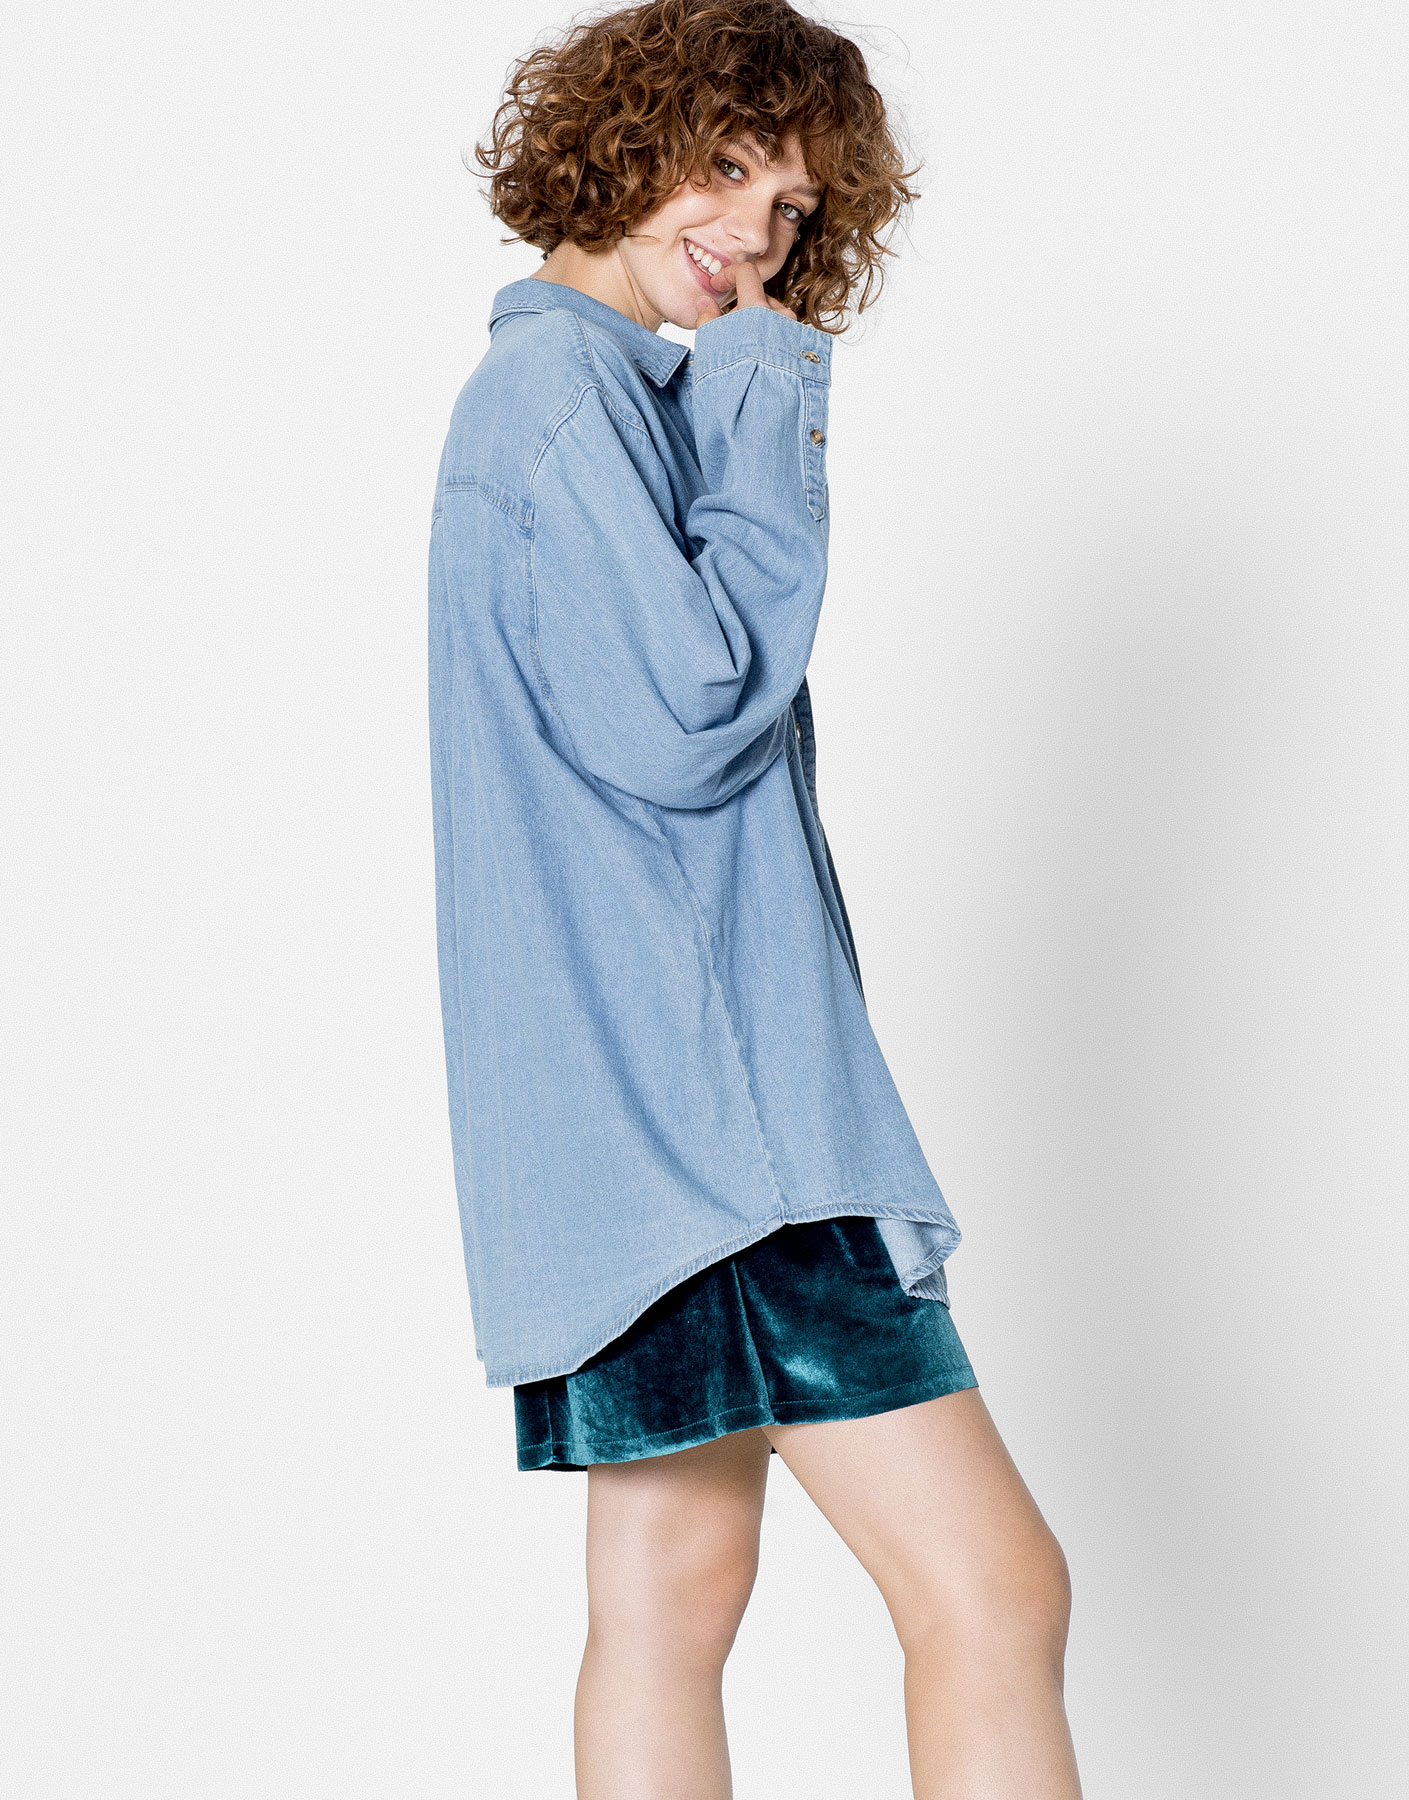 denim lust 10 ways of styling denim skirt